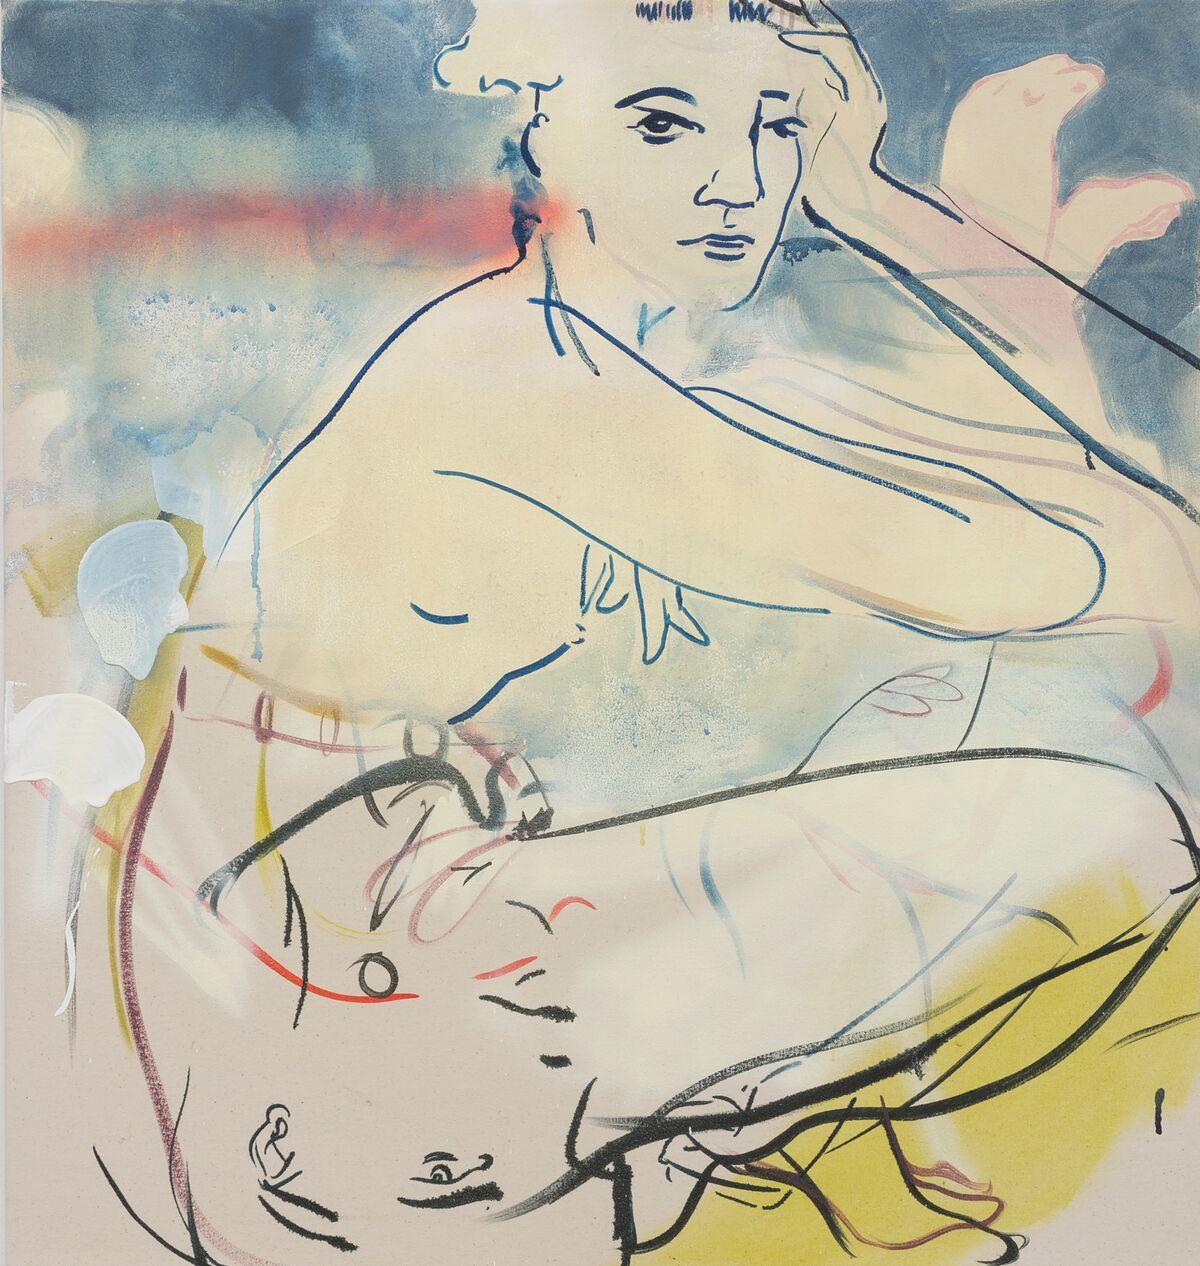 France-Lise McGurn, Hermione Hormone, 2016